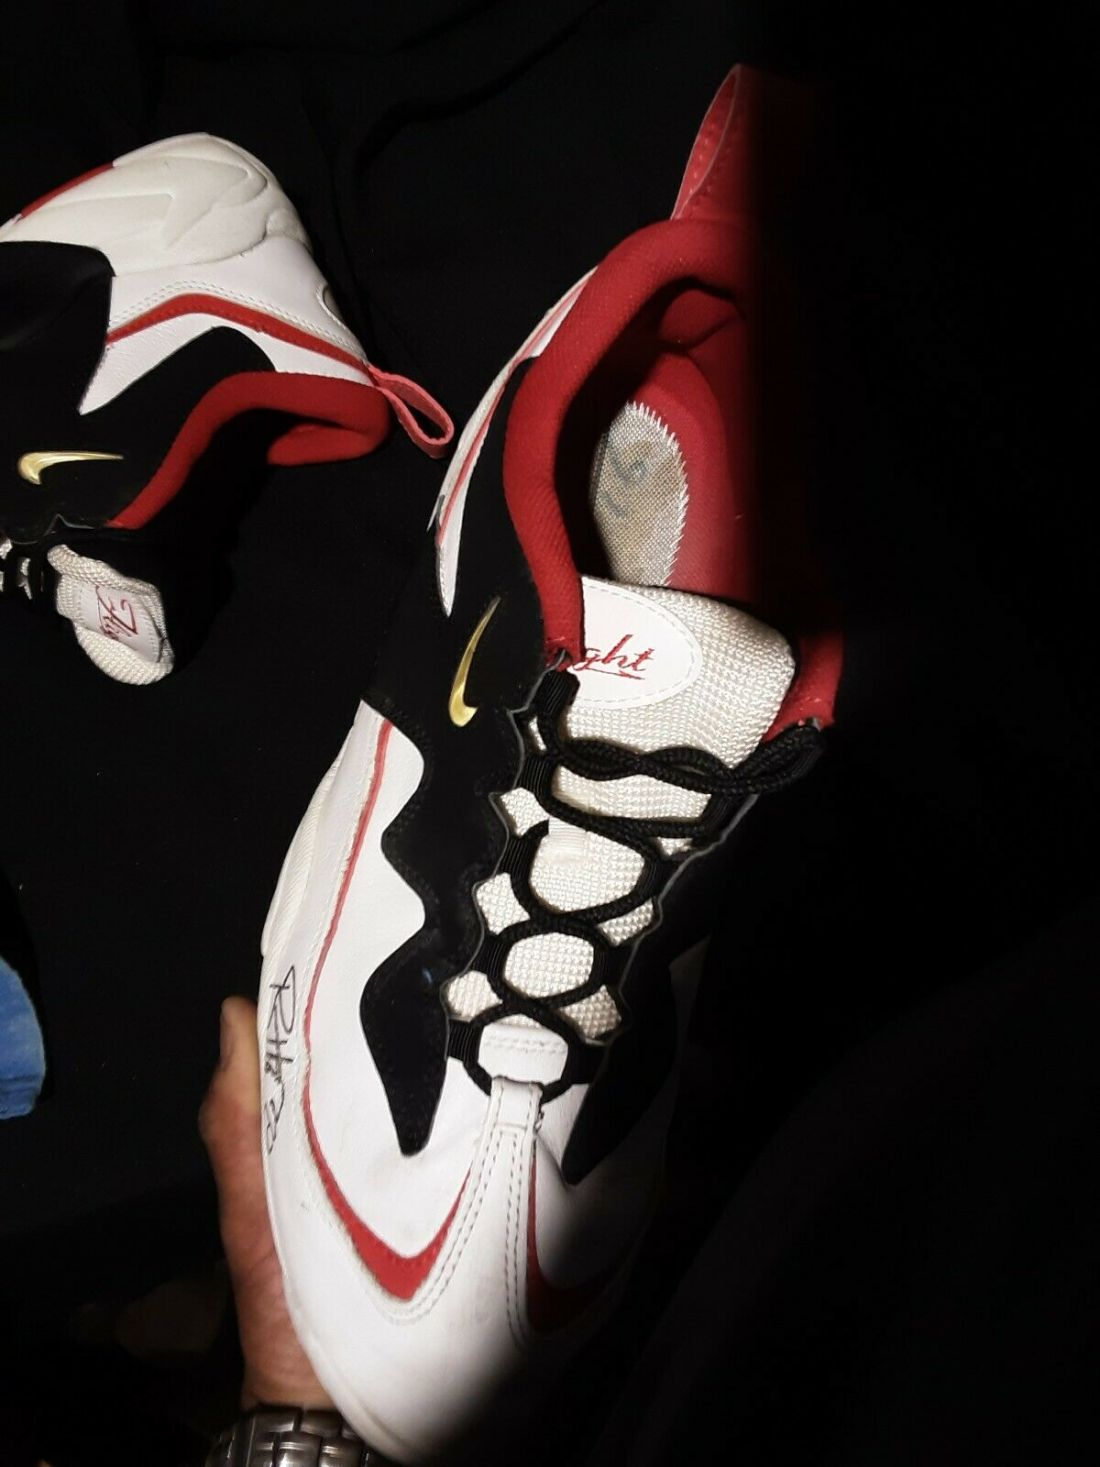 Ron Harper's Nike Air Lambaste